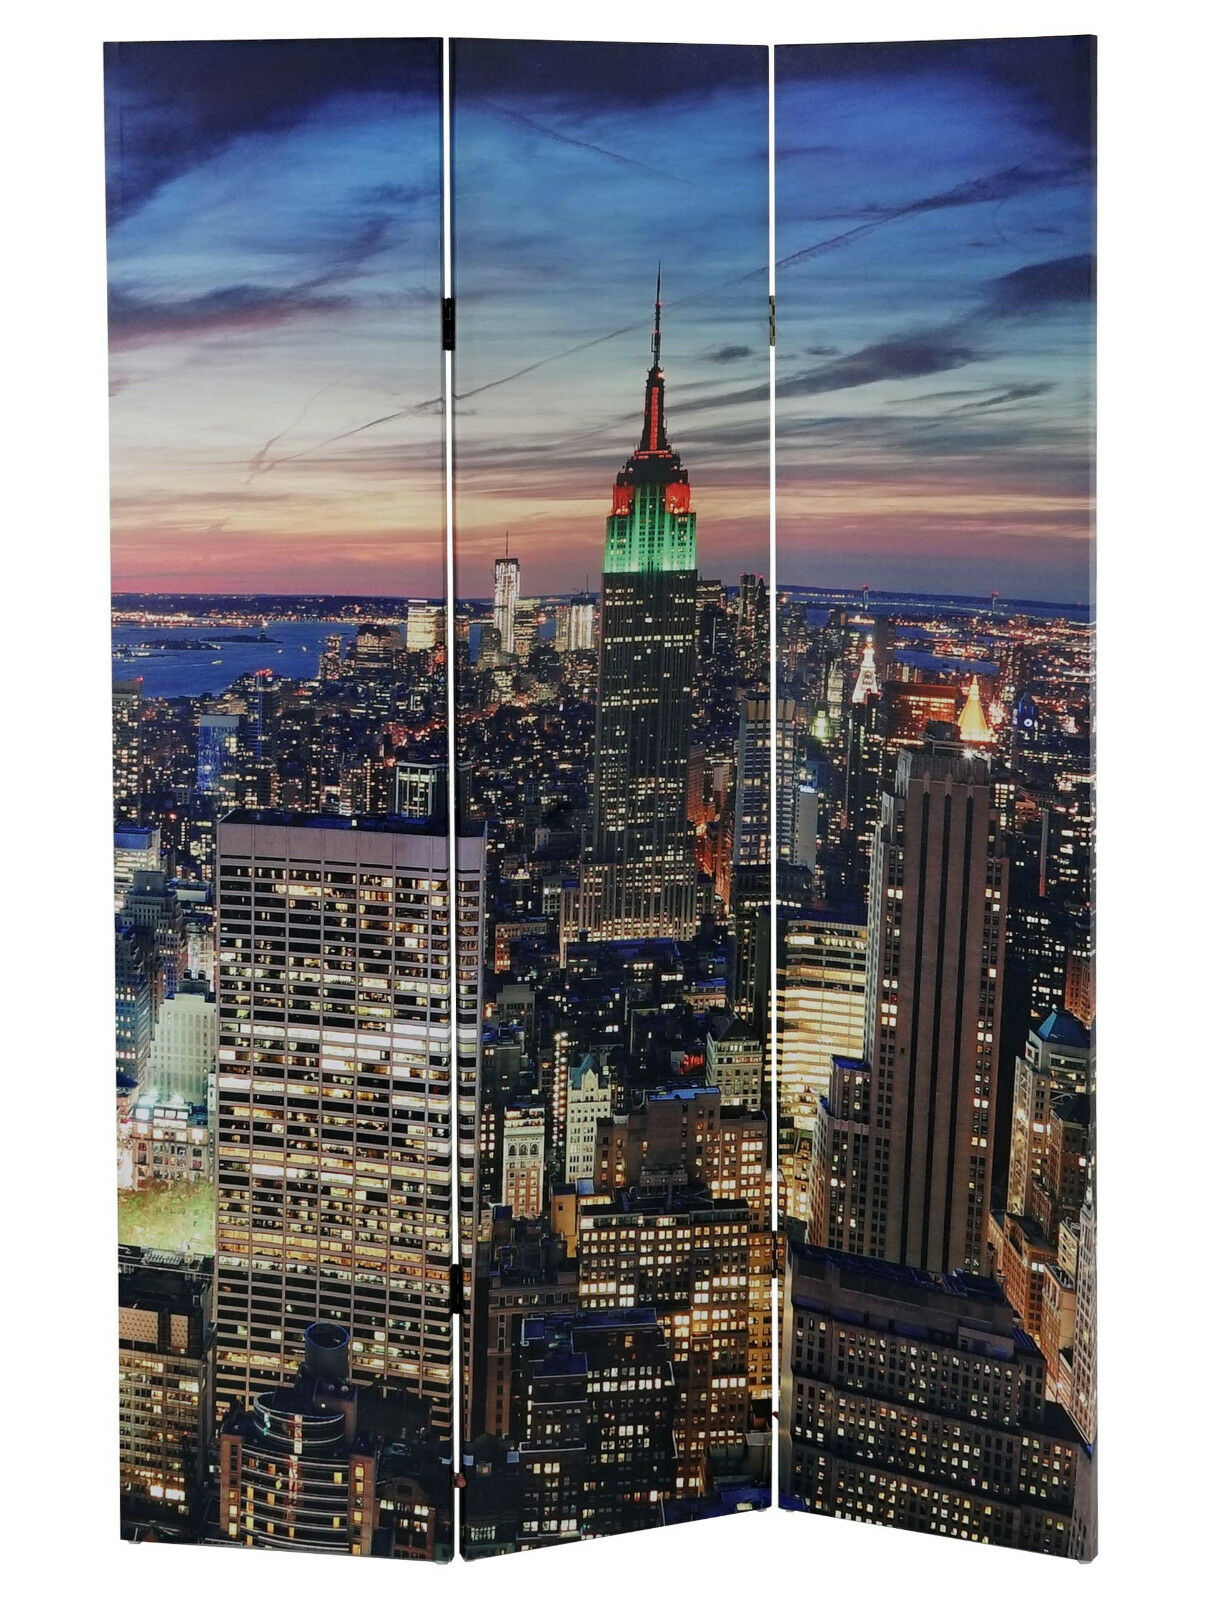 180x120 LED RAUMTEILER NEW YORK PARAVENT NETZBETRIEB TIMER PARAVANT RAUMTRENNER